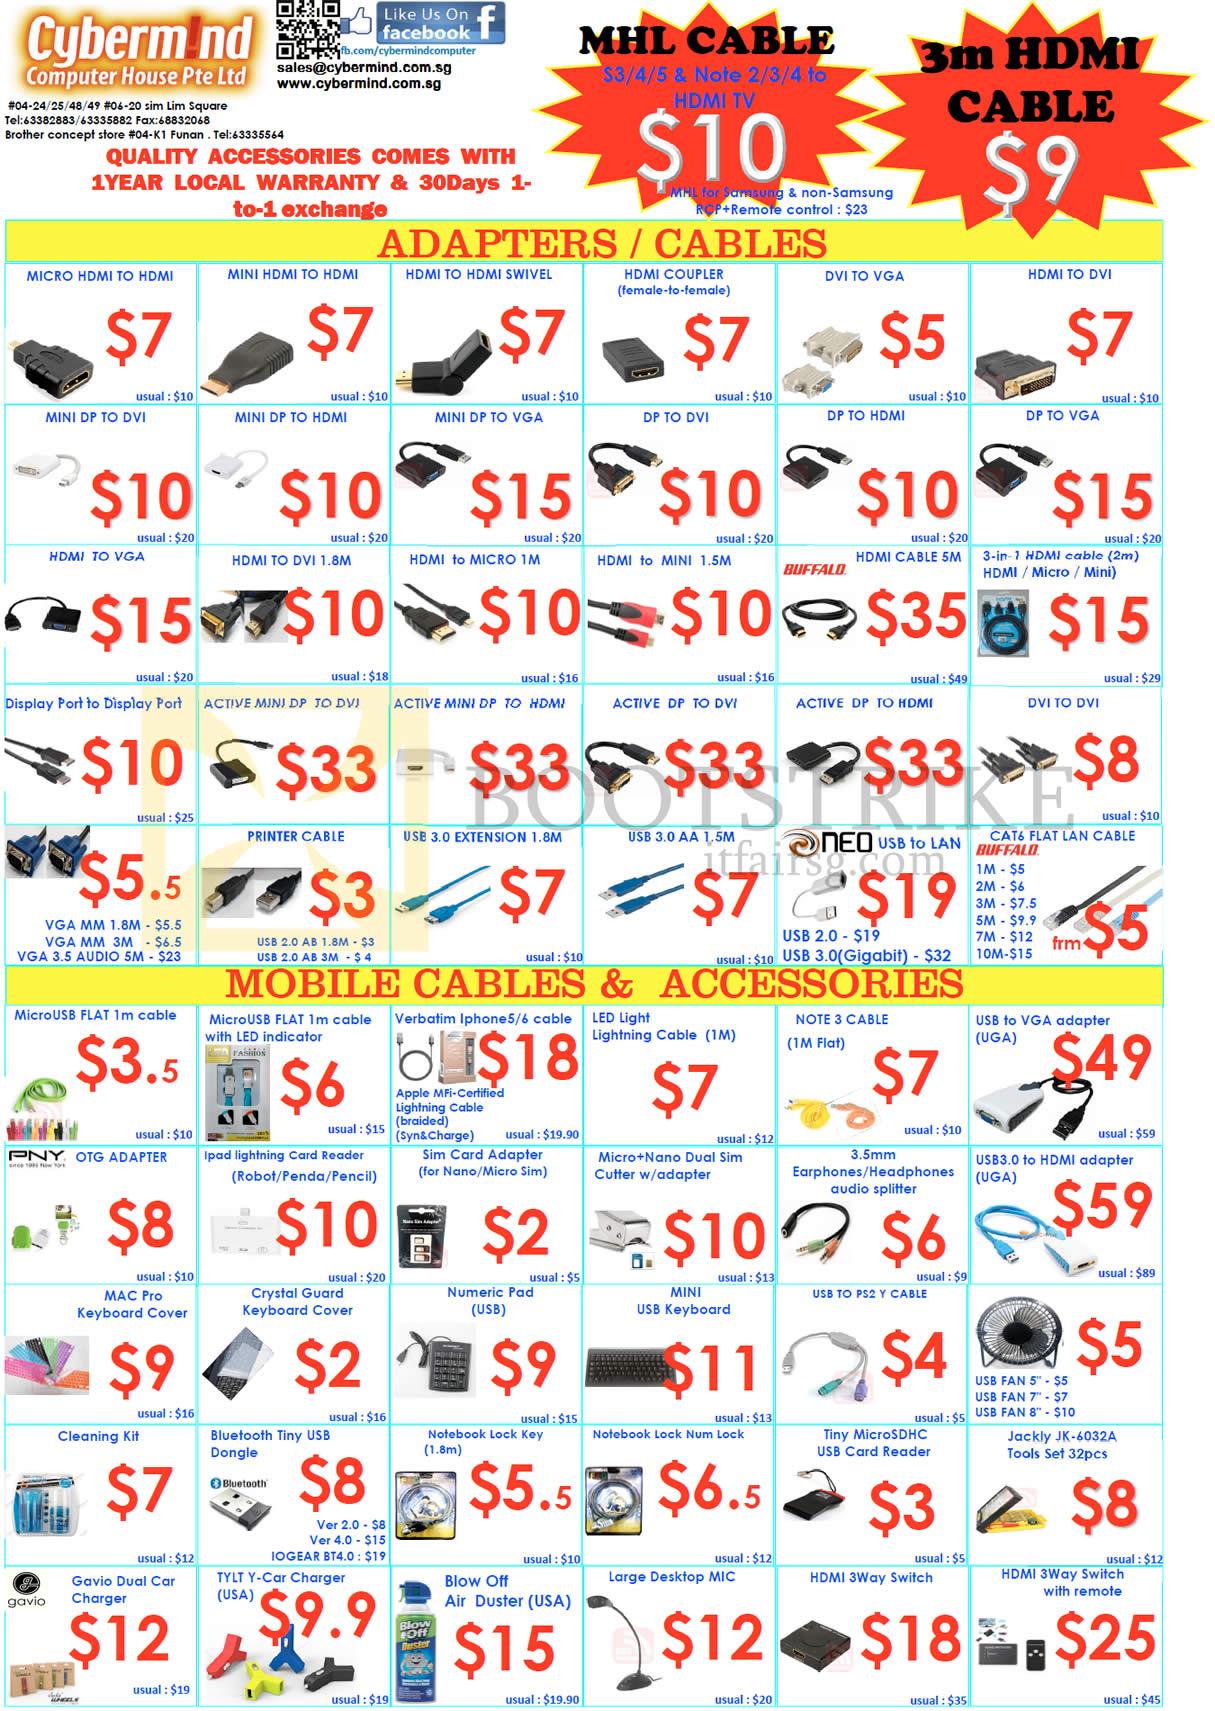 SITEX 2014 price list image brochure of Cybermind Accessories Adapters HDMI, DVI, VGA, DisplayPort, Micro USB, LED Light Lightning, Splitter, Cover, Adapter